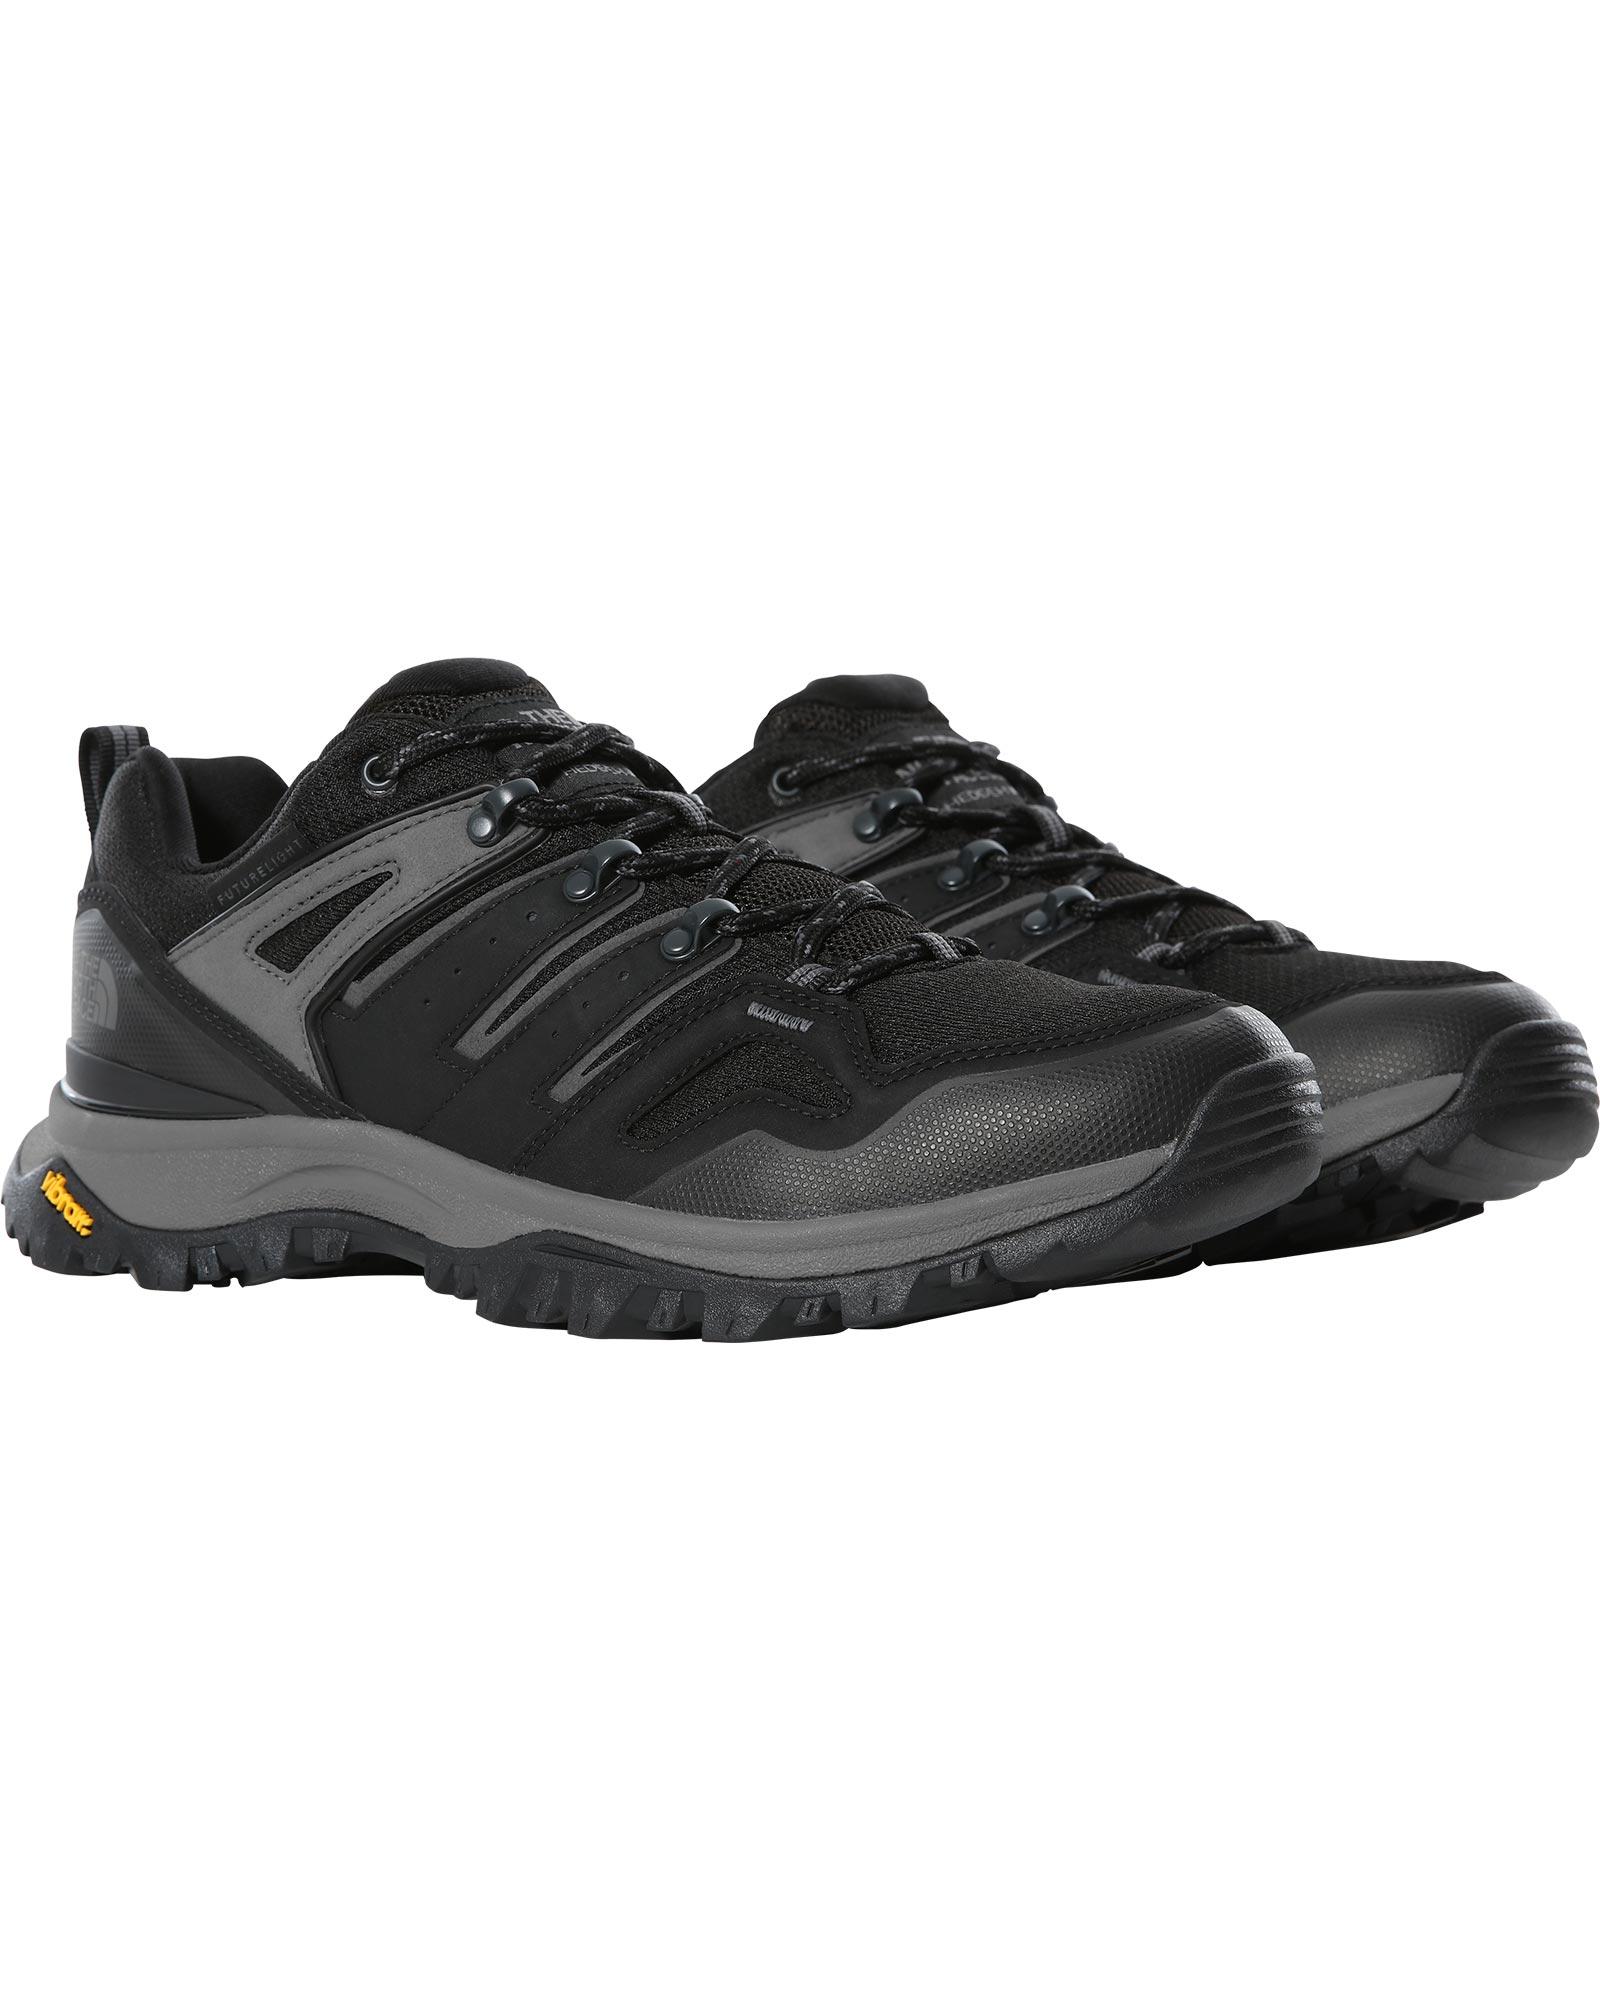 The North Face Hedgehog FUTURELIGHT Men's Shoes 0